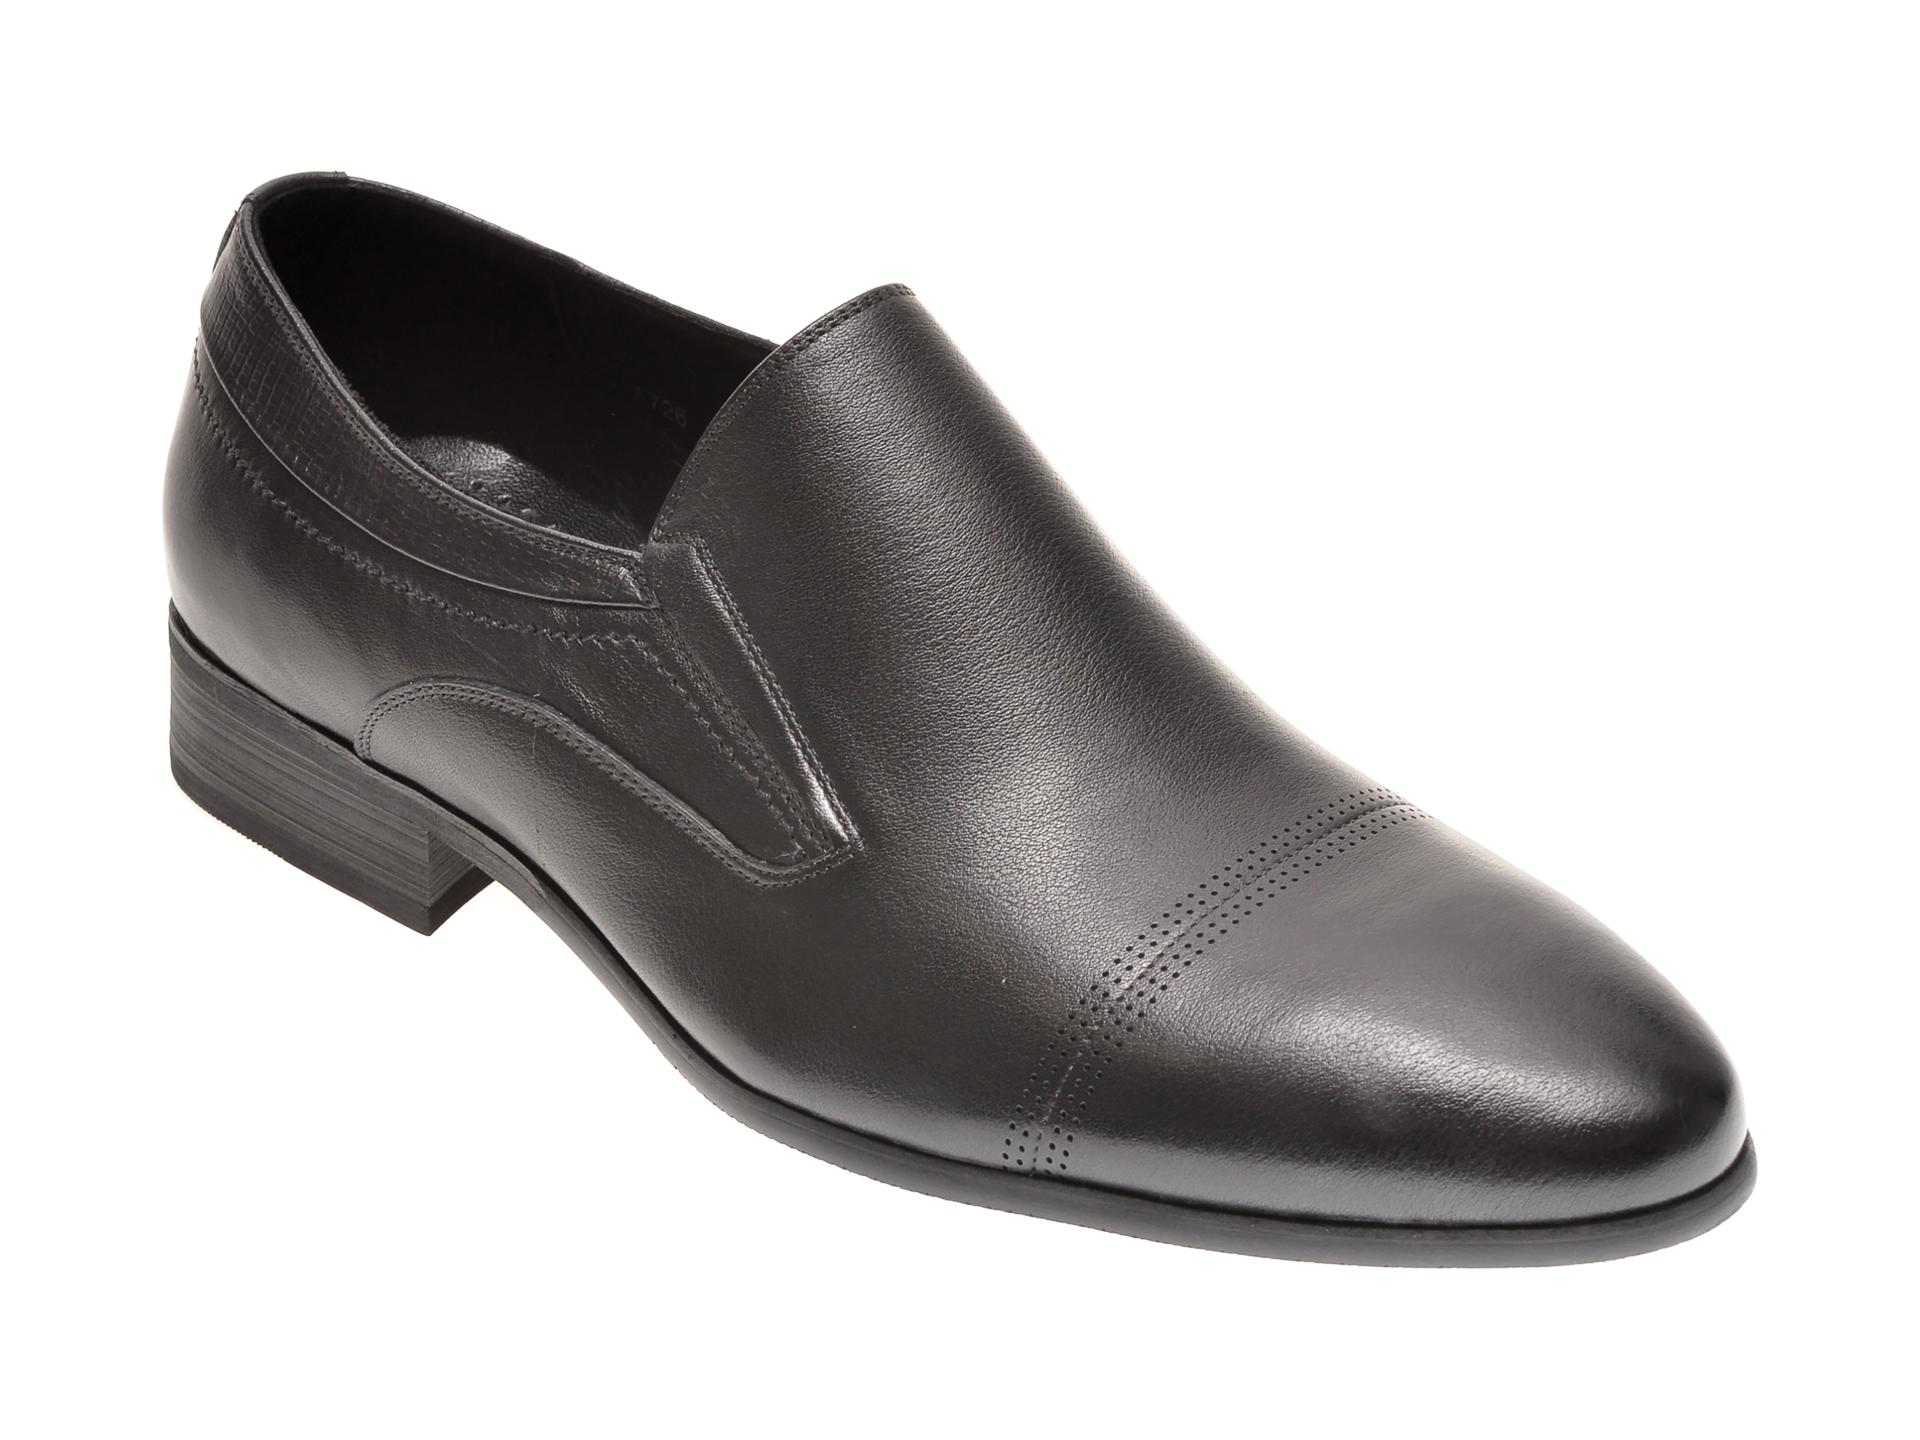 Pantofi OTTER negri, A726, din piele naturala imagine